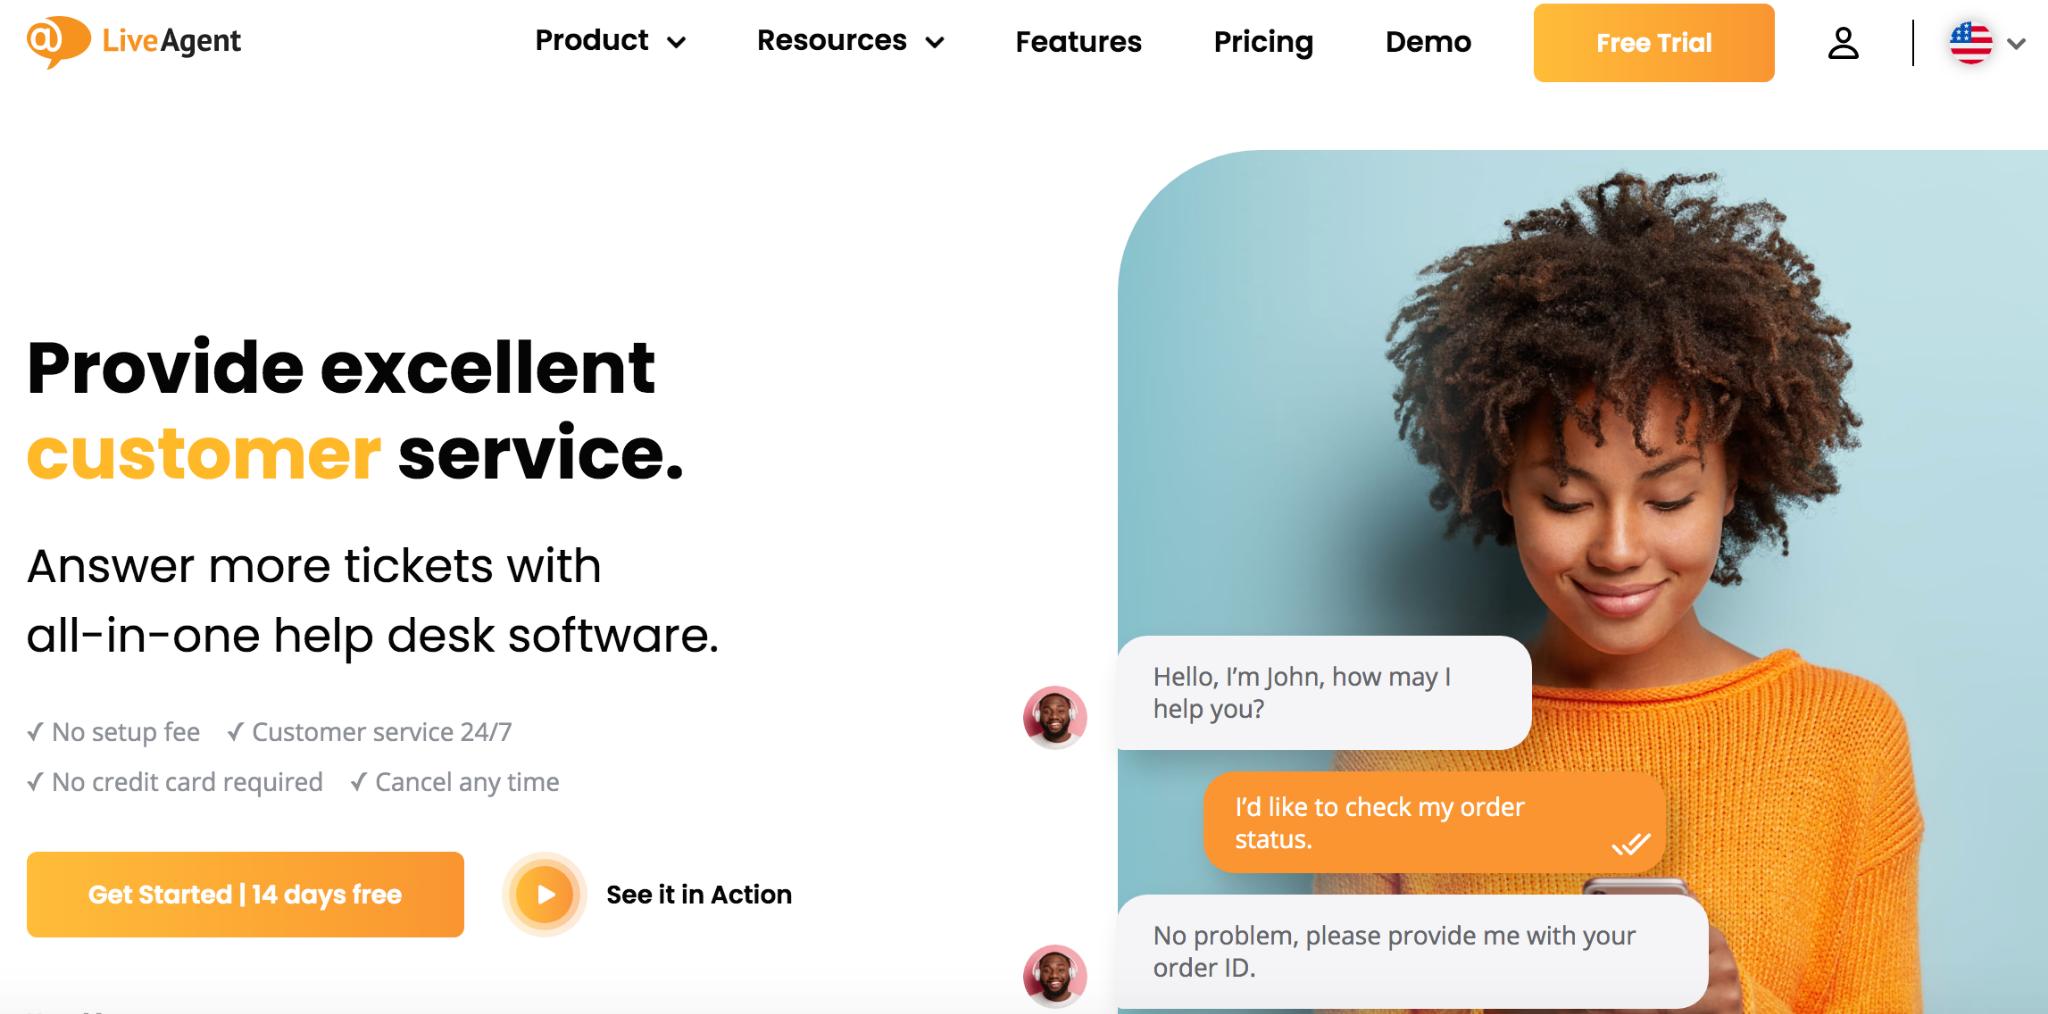 LiveAgent homepage: Provide excellent customer service.